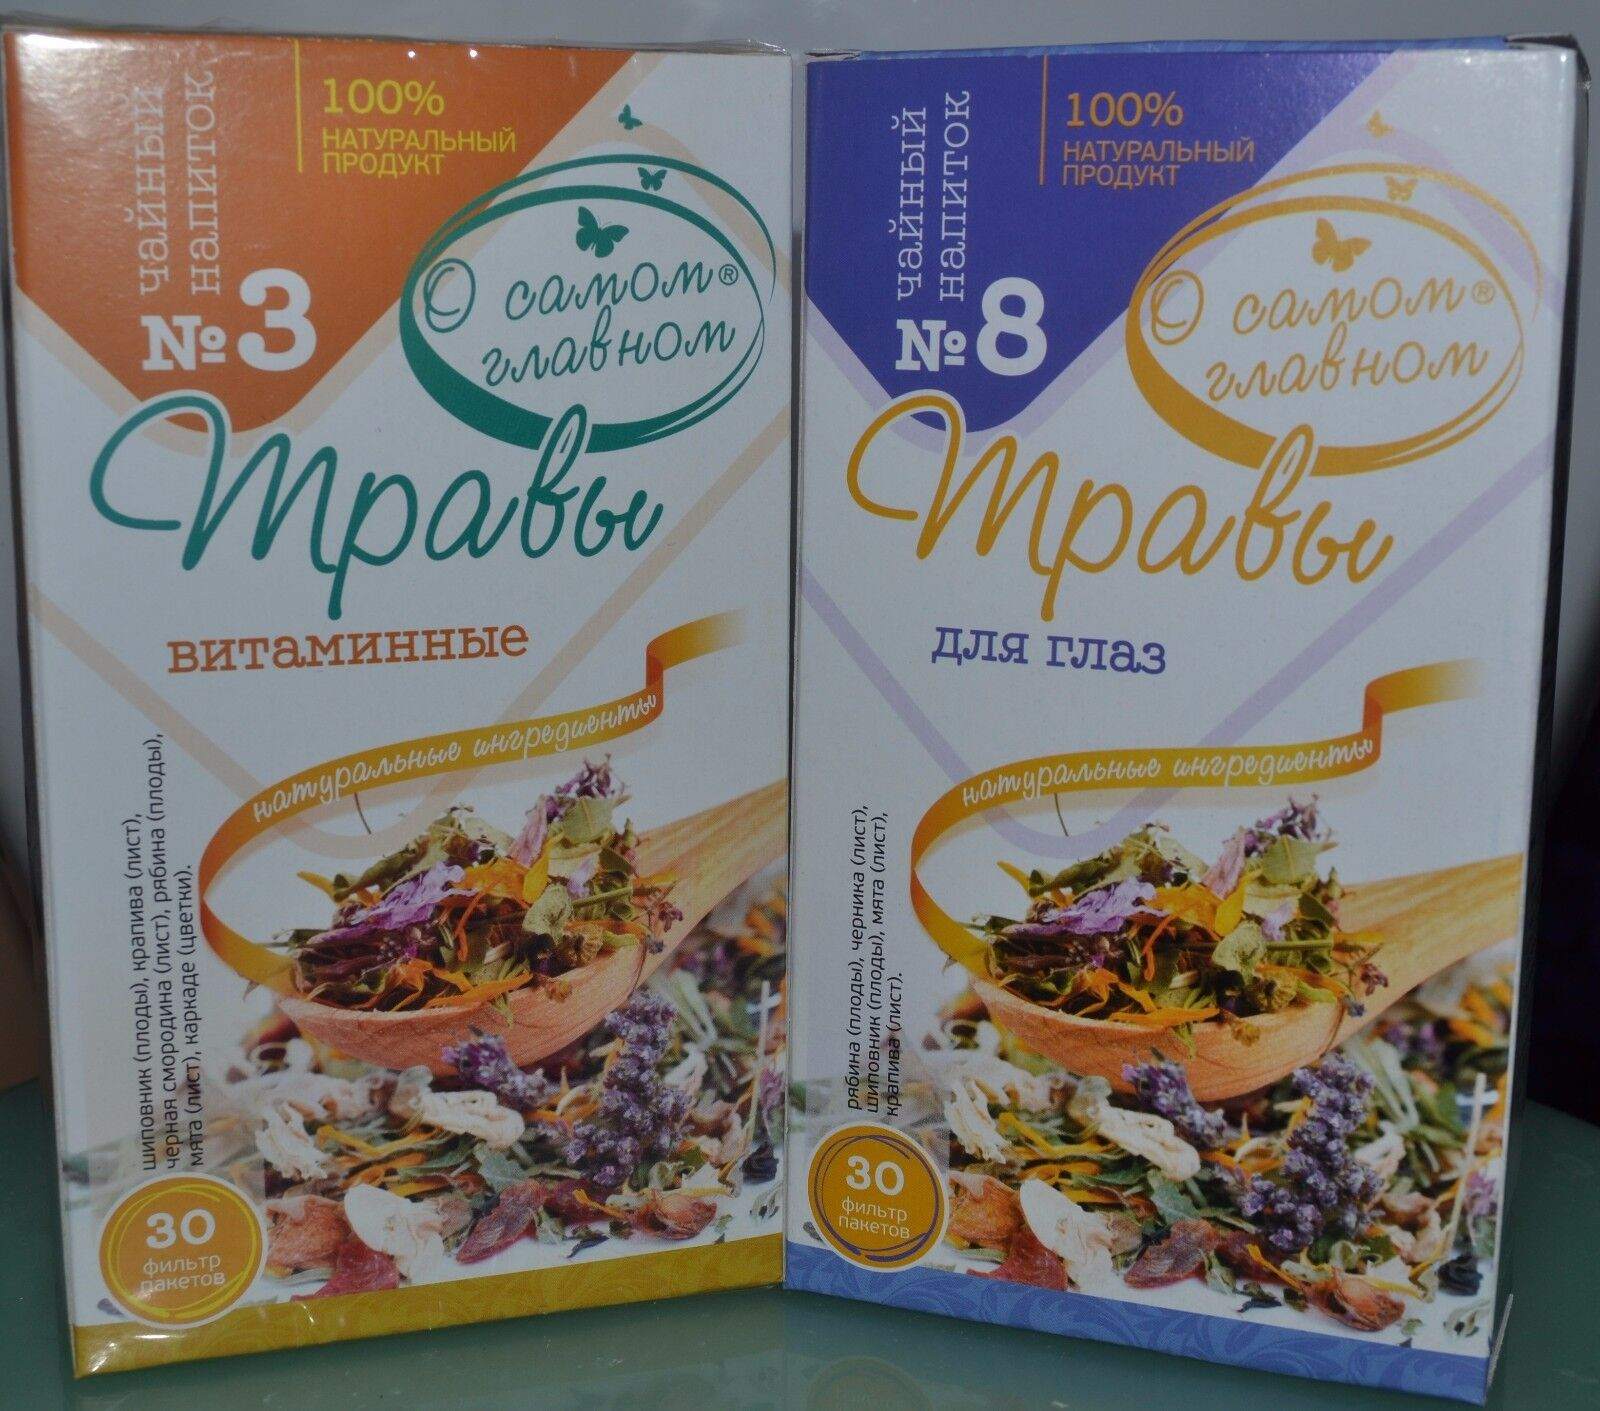 herbal tea healthy beverage 100 percent natural